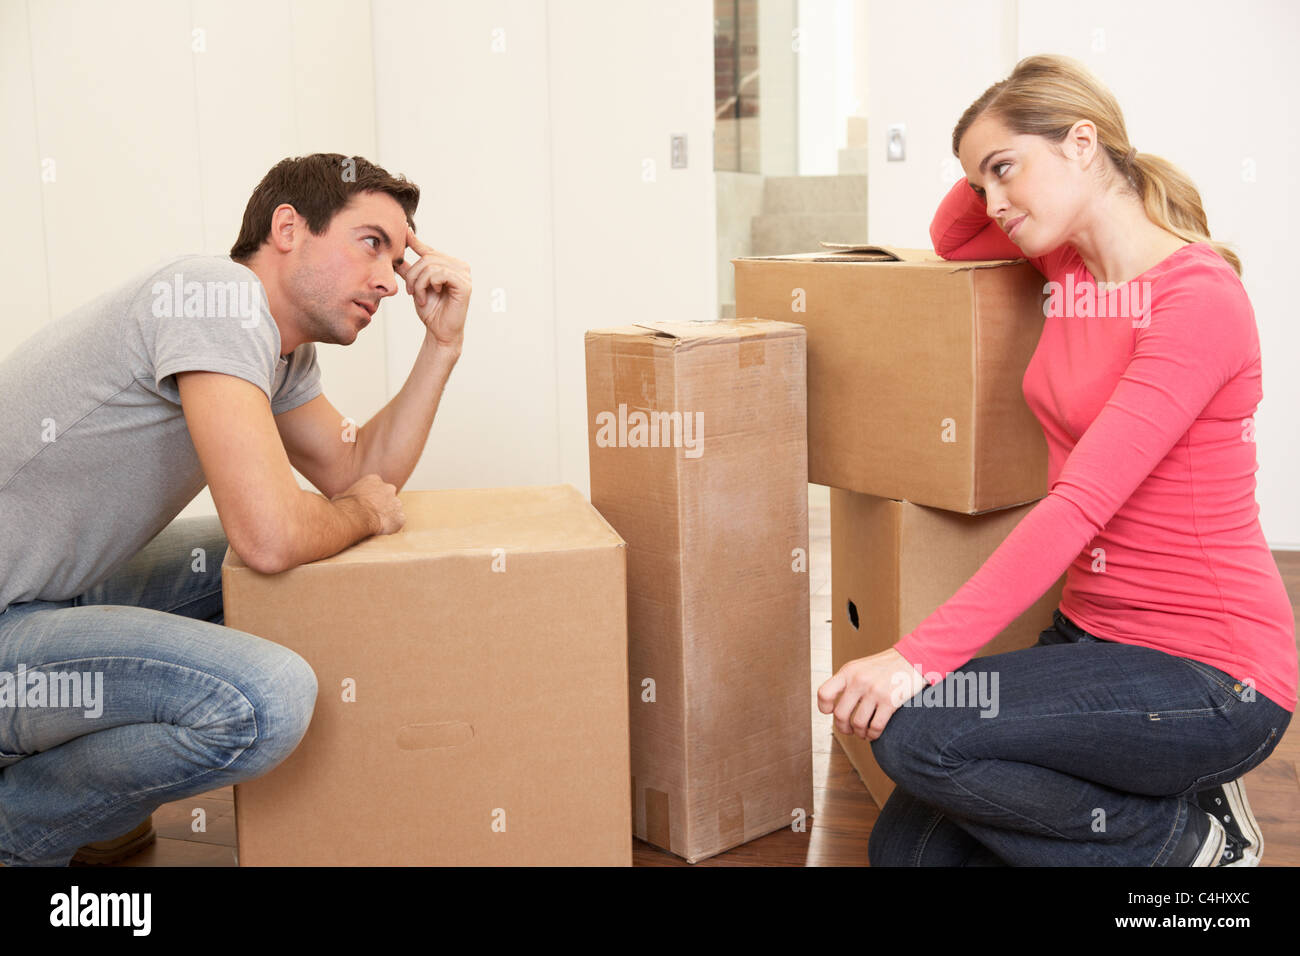 Young couple looking upset among boxes - Stock Image